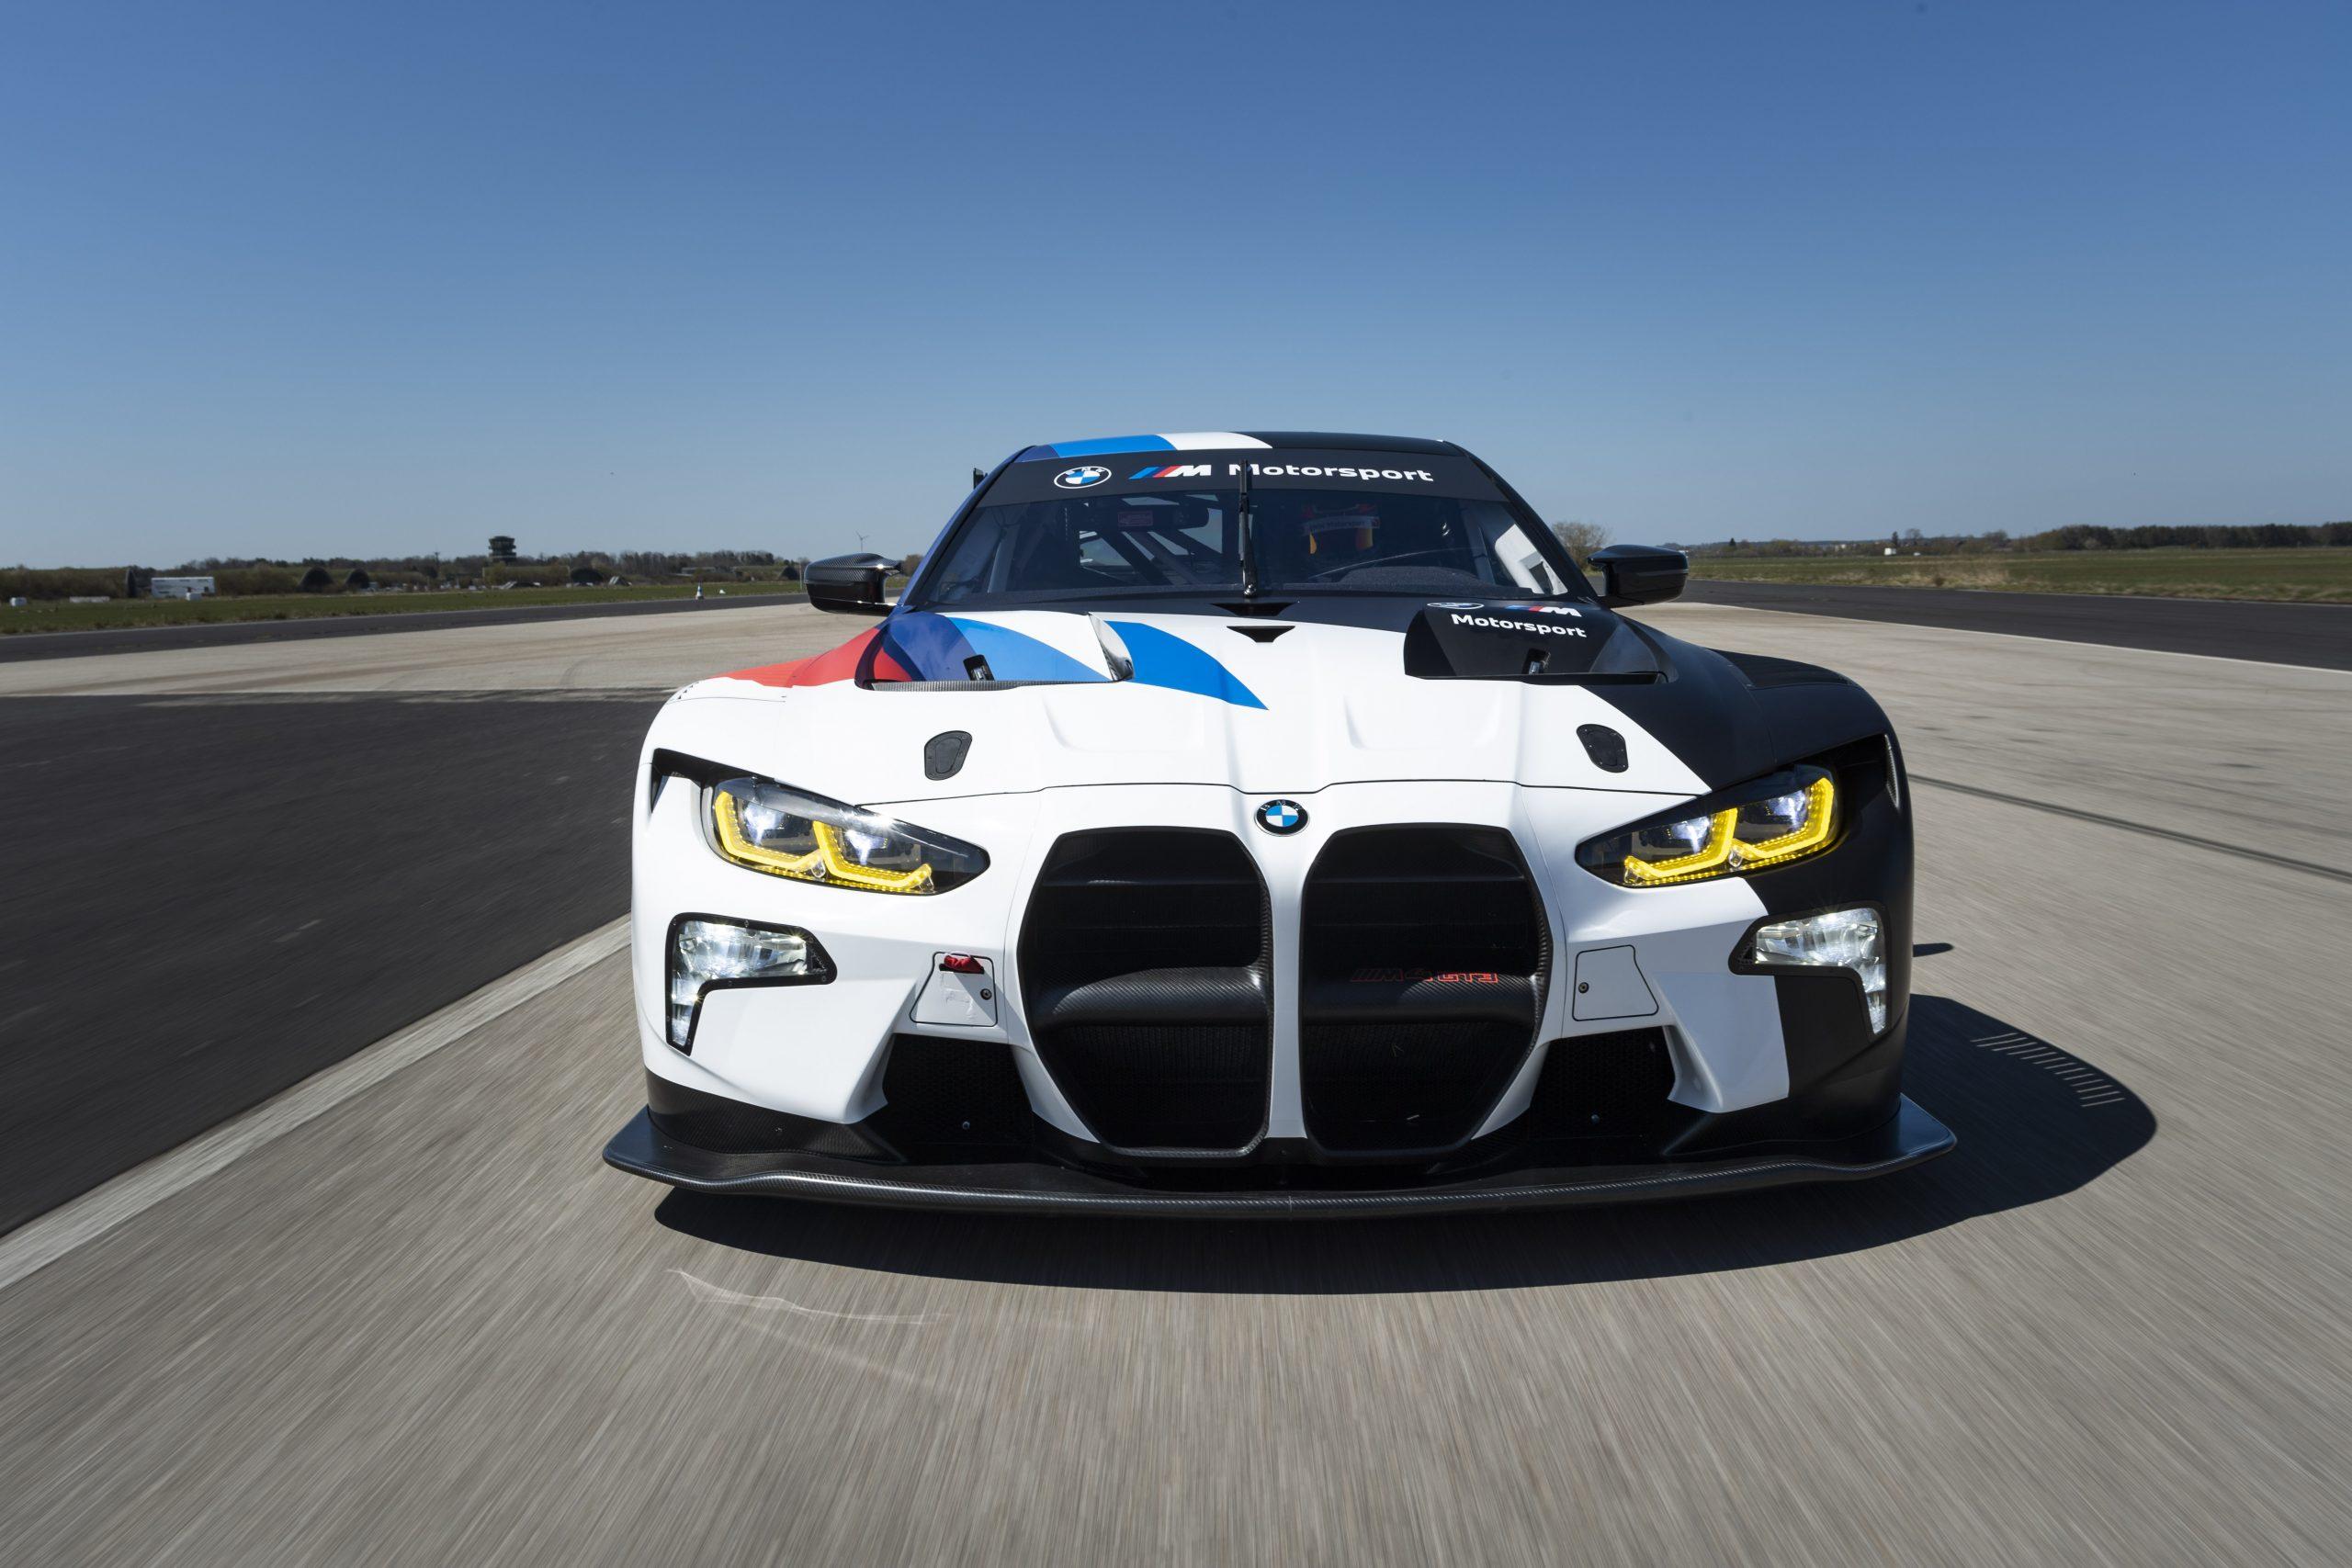 P90424778 highRes scaled Πρεμιέρα για την BMW M4 GT3 στην Eau Rouge BMW, BMW M, BMW M4, BMW M4 GT3, BMW Motorsport, M4 GT3, αγωνες, αγωνιστικά, ειδήσεις, Νέα